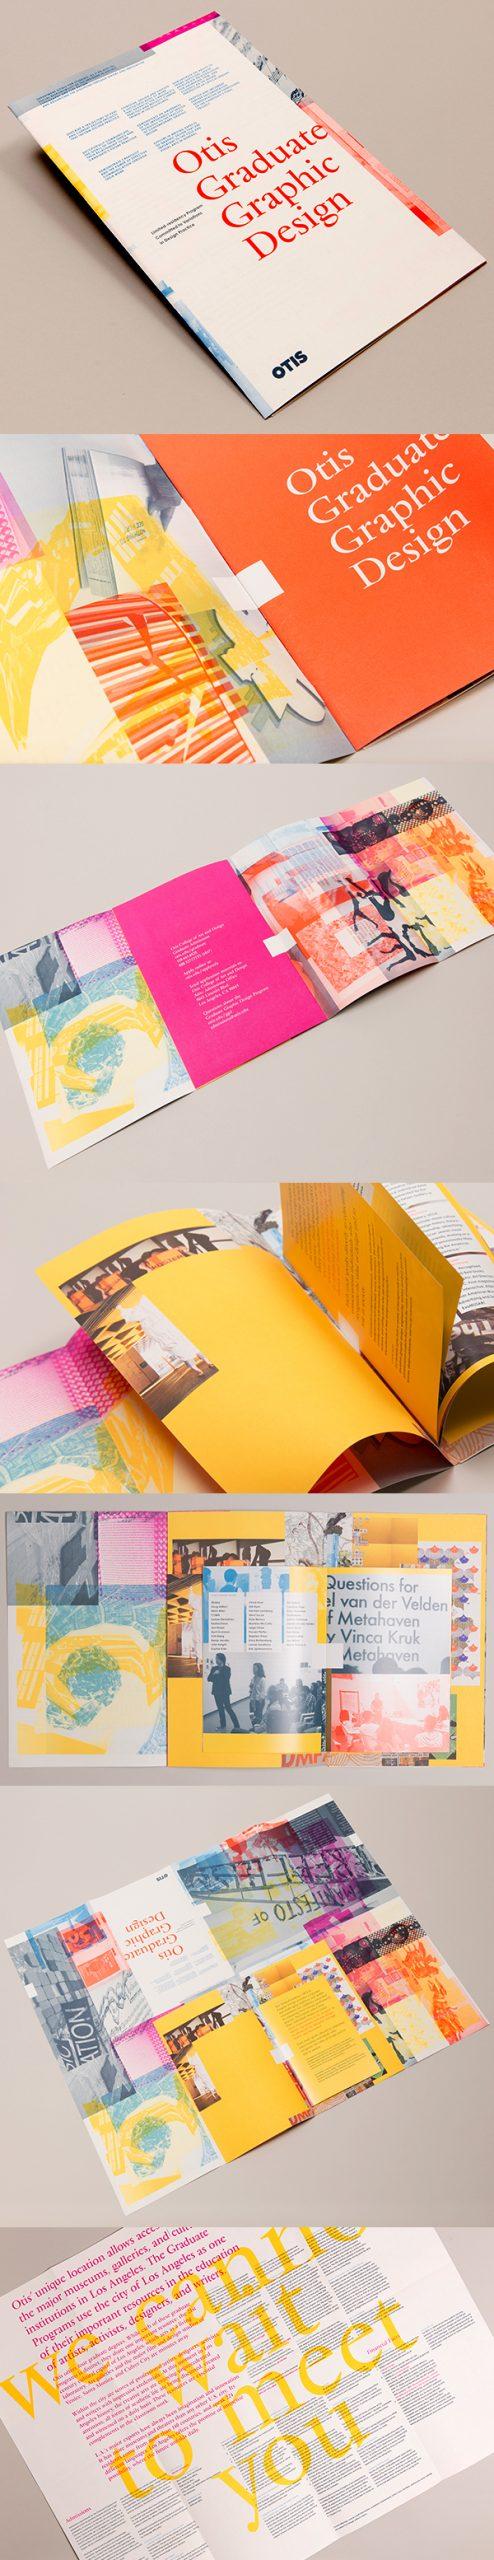 design: Juliette Bellocq. photos: Andy Reed.